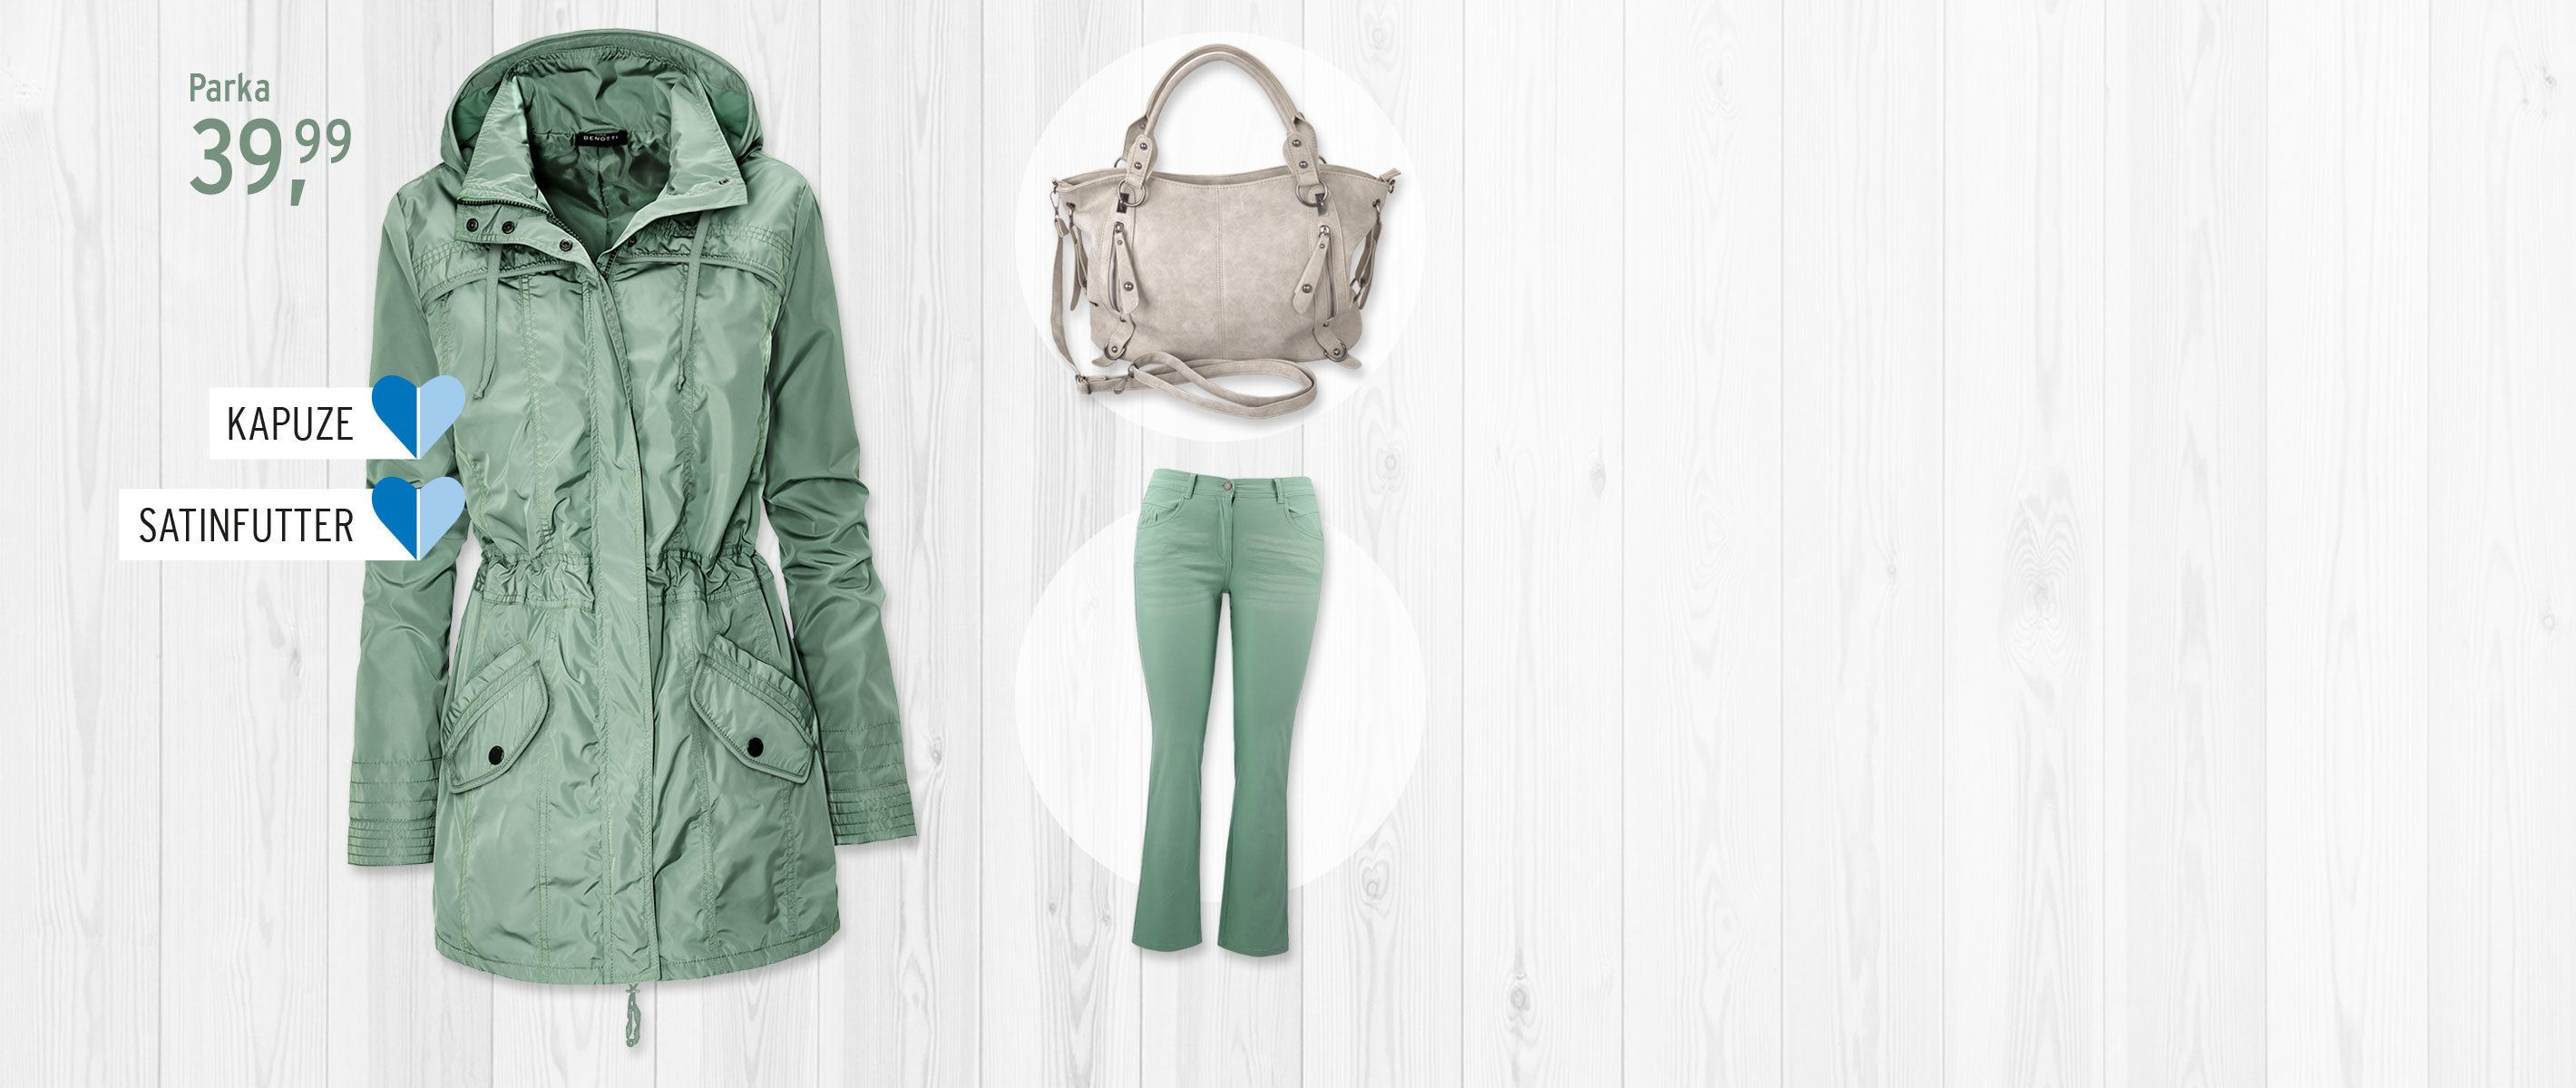 Damenmode In Grossen Grossen Gunstig Kaufen Ernsting S Family Regen Mode Mode Wolle Kaufen